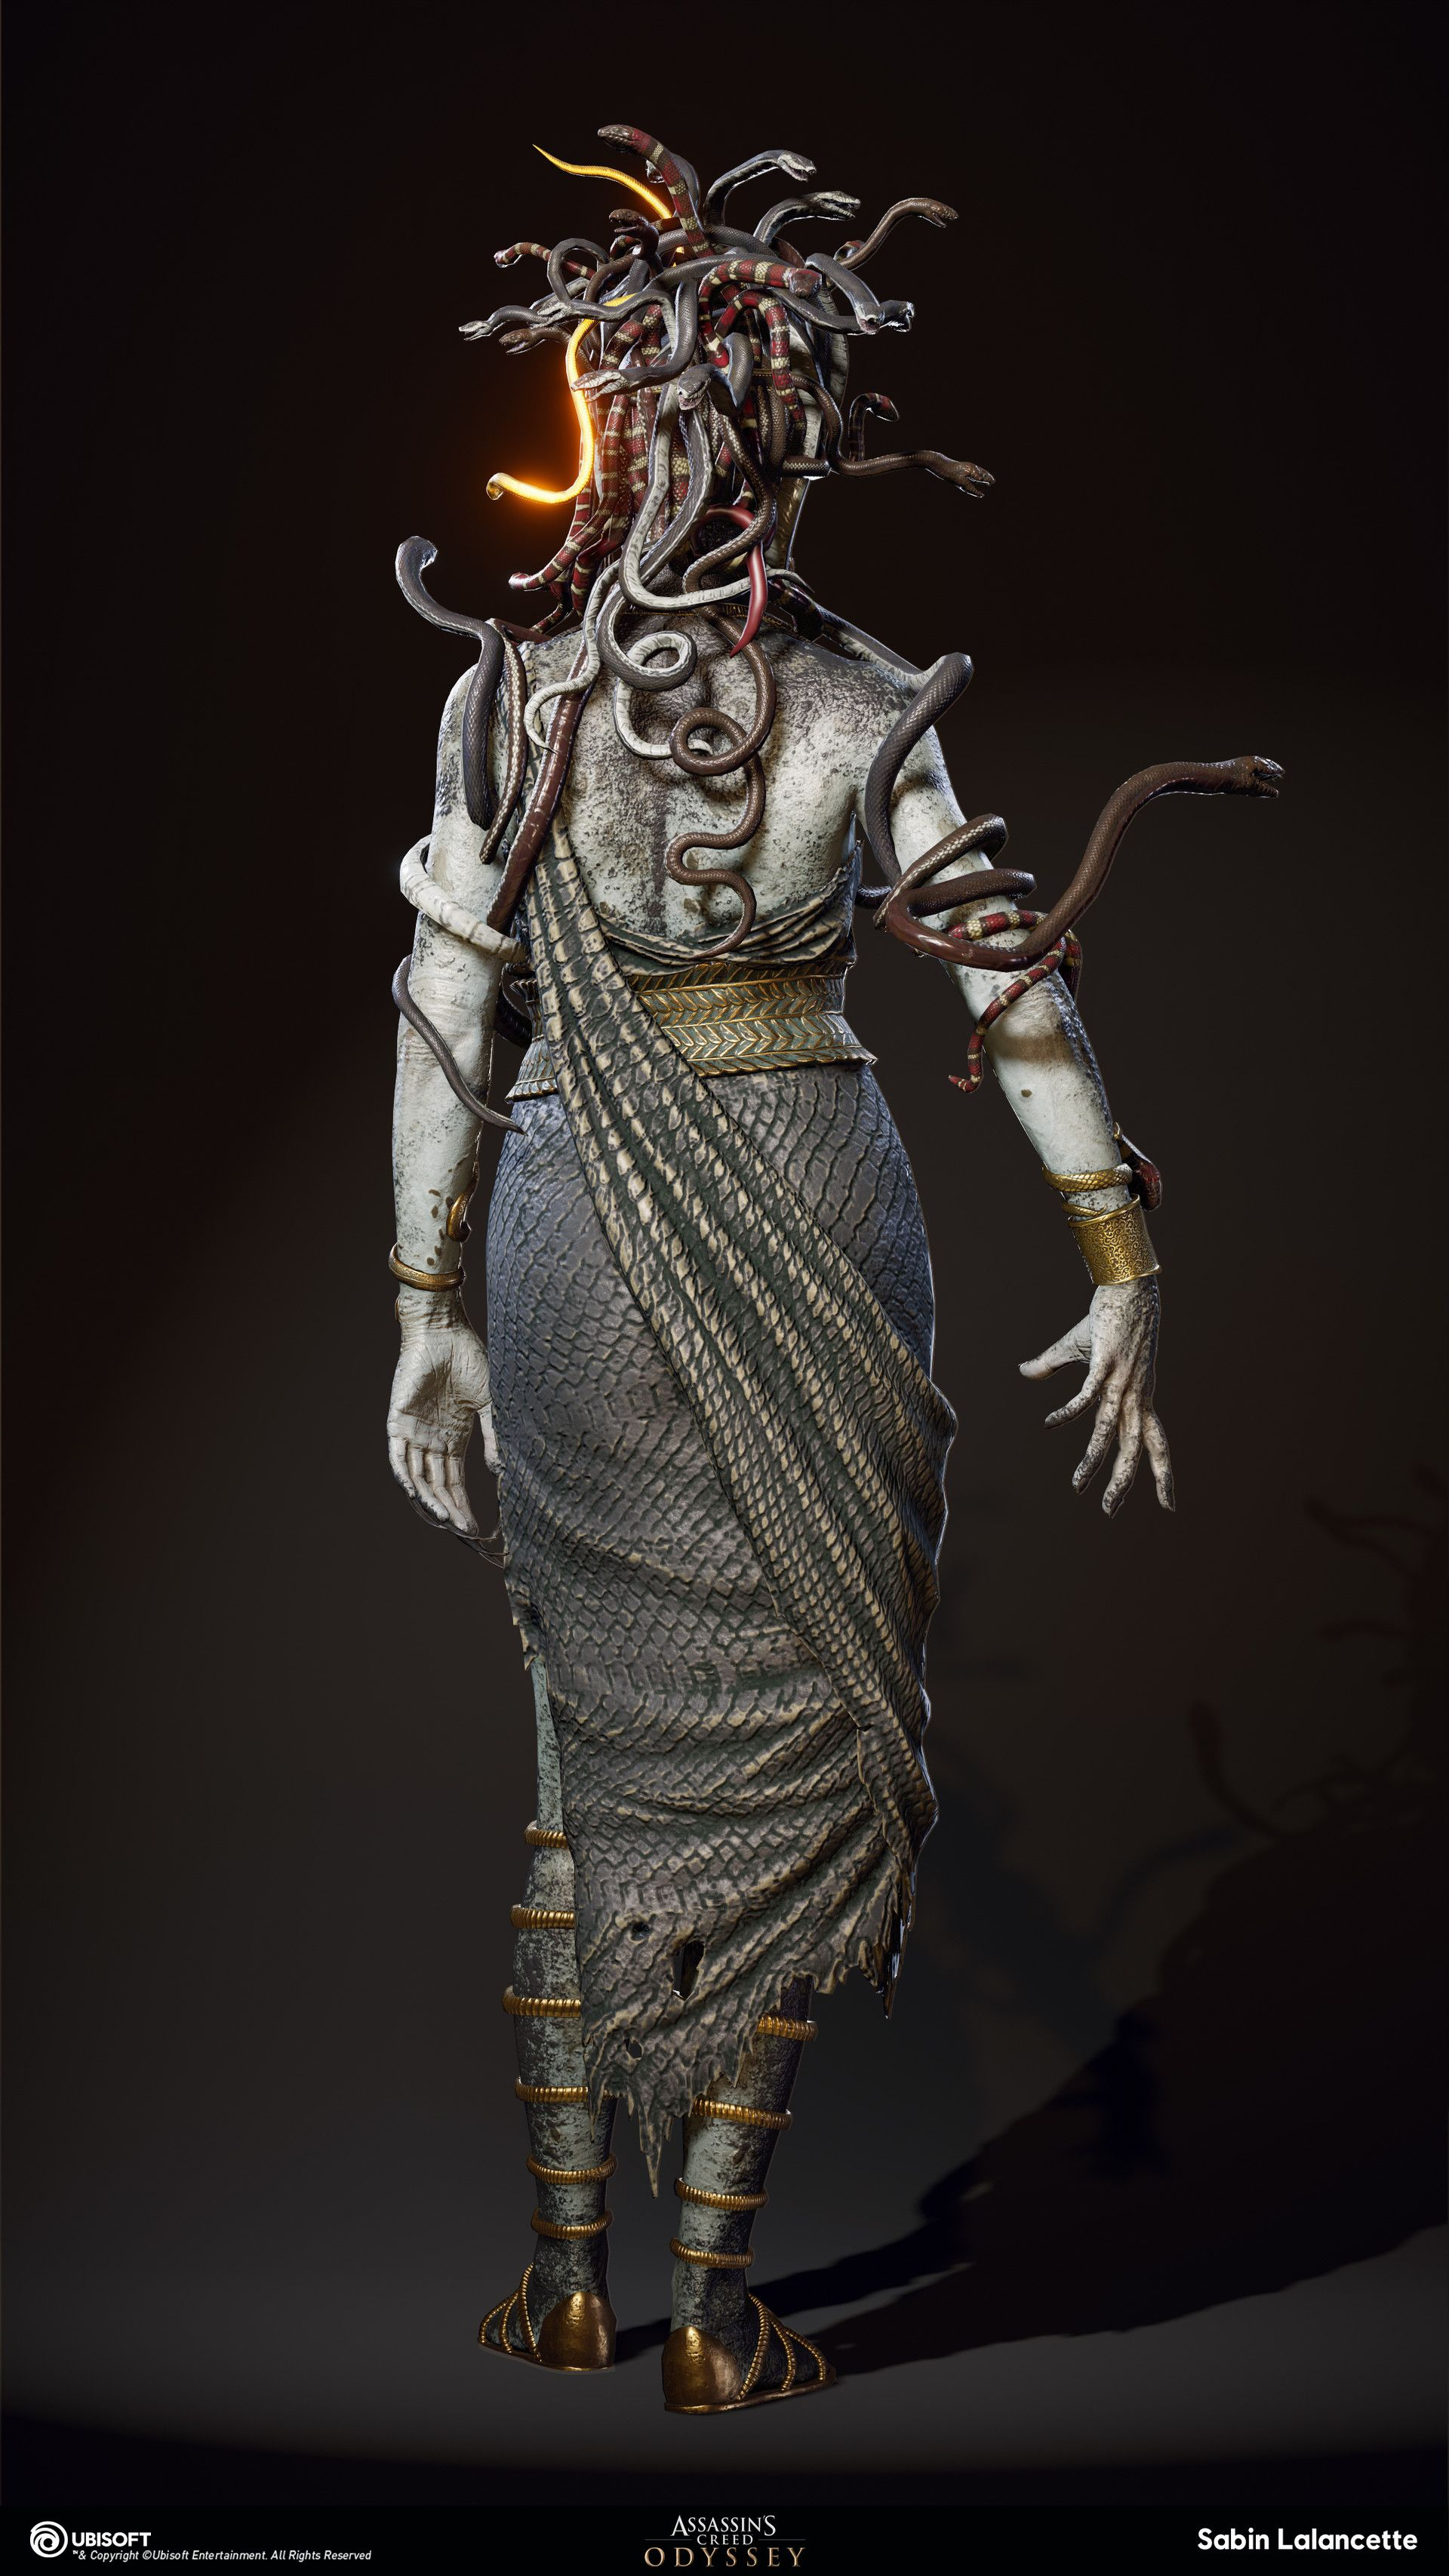 Assassin's Creed Odyssey Medusa : assassin's, creed, odyssey, medusa, ArtStation, Mythical, Creature, Medusa,, Sabin, Lalancette, Assassins, Creed, Artwork,, Creatures,, Odyssey